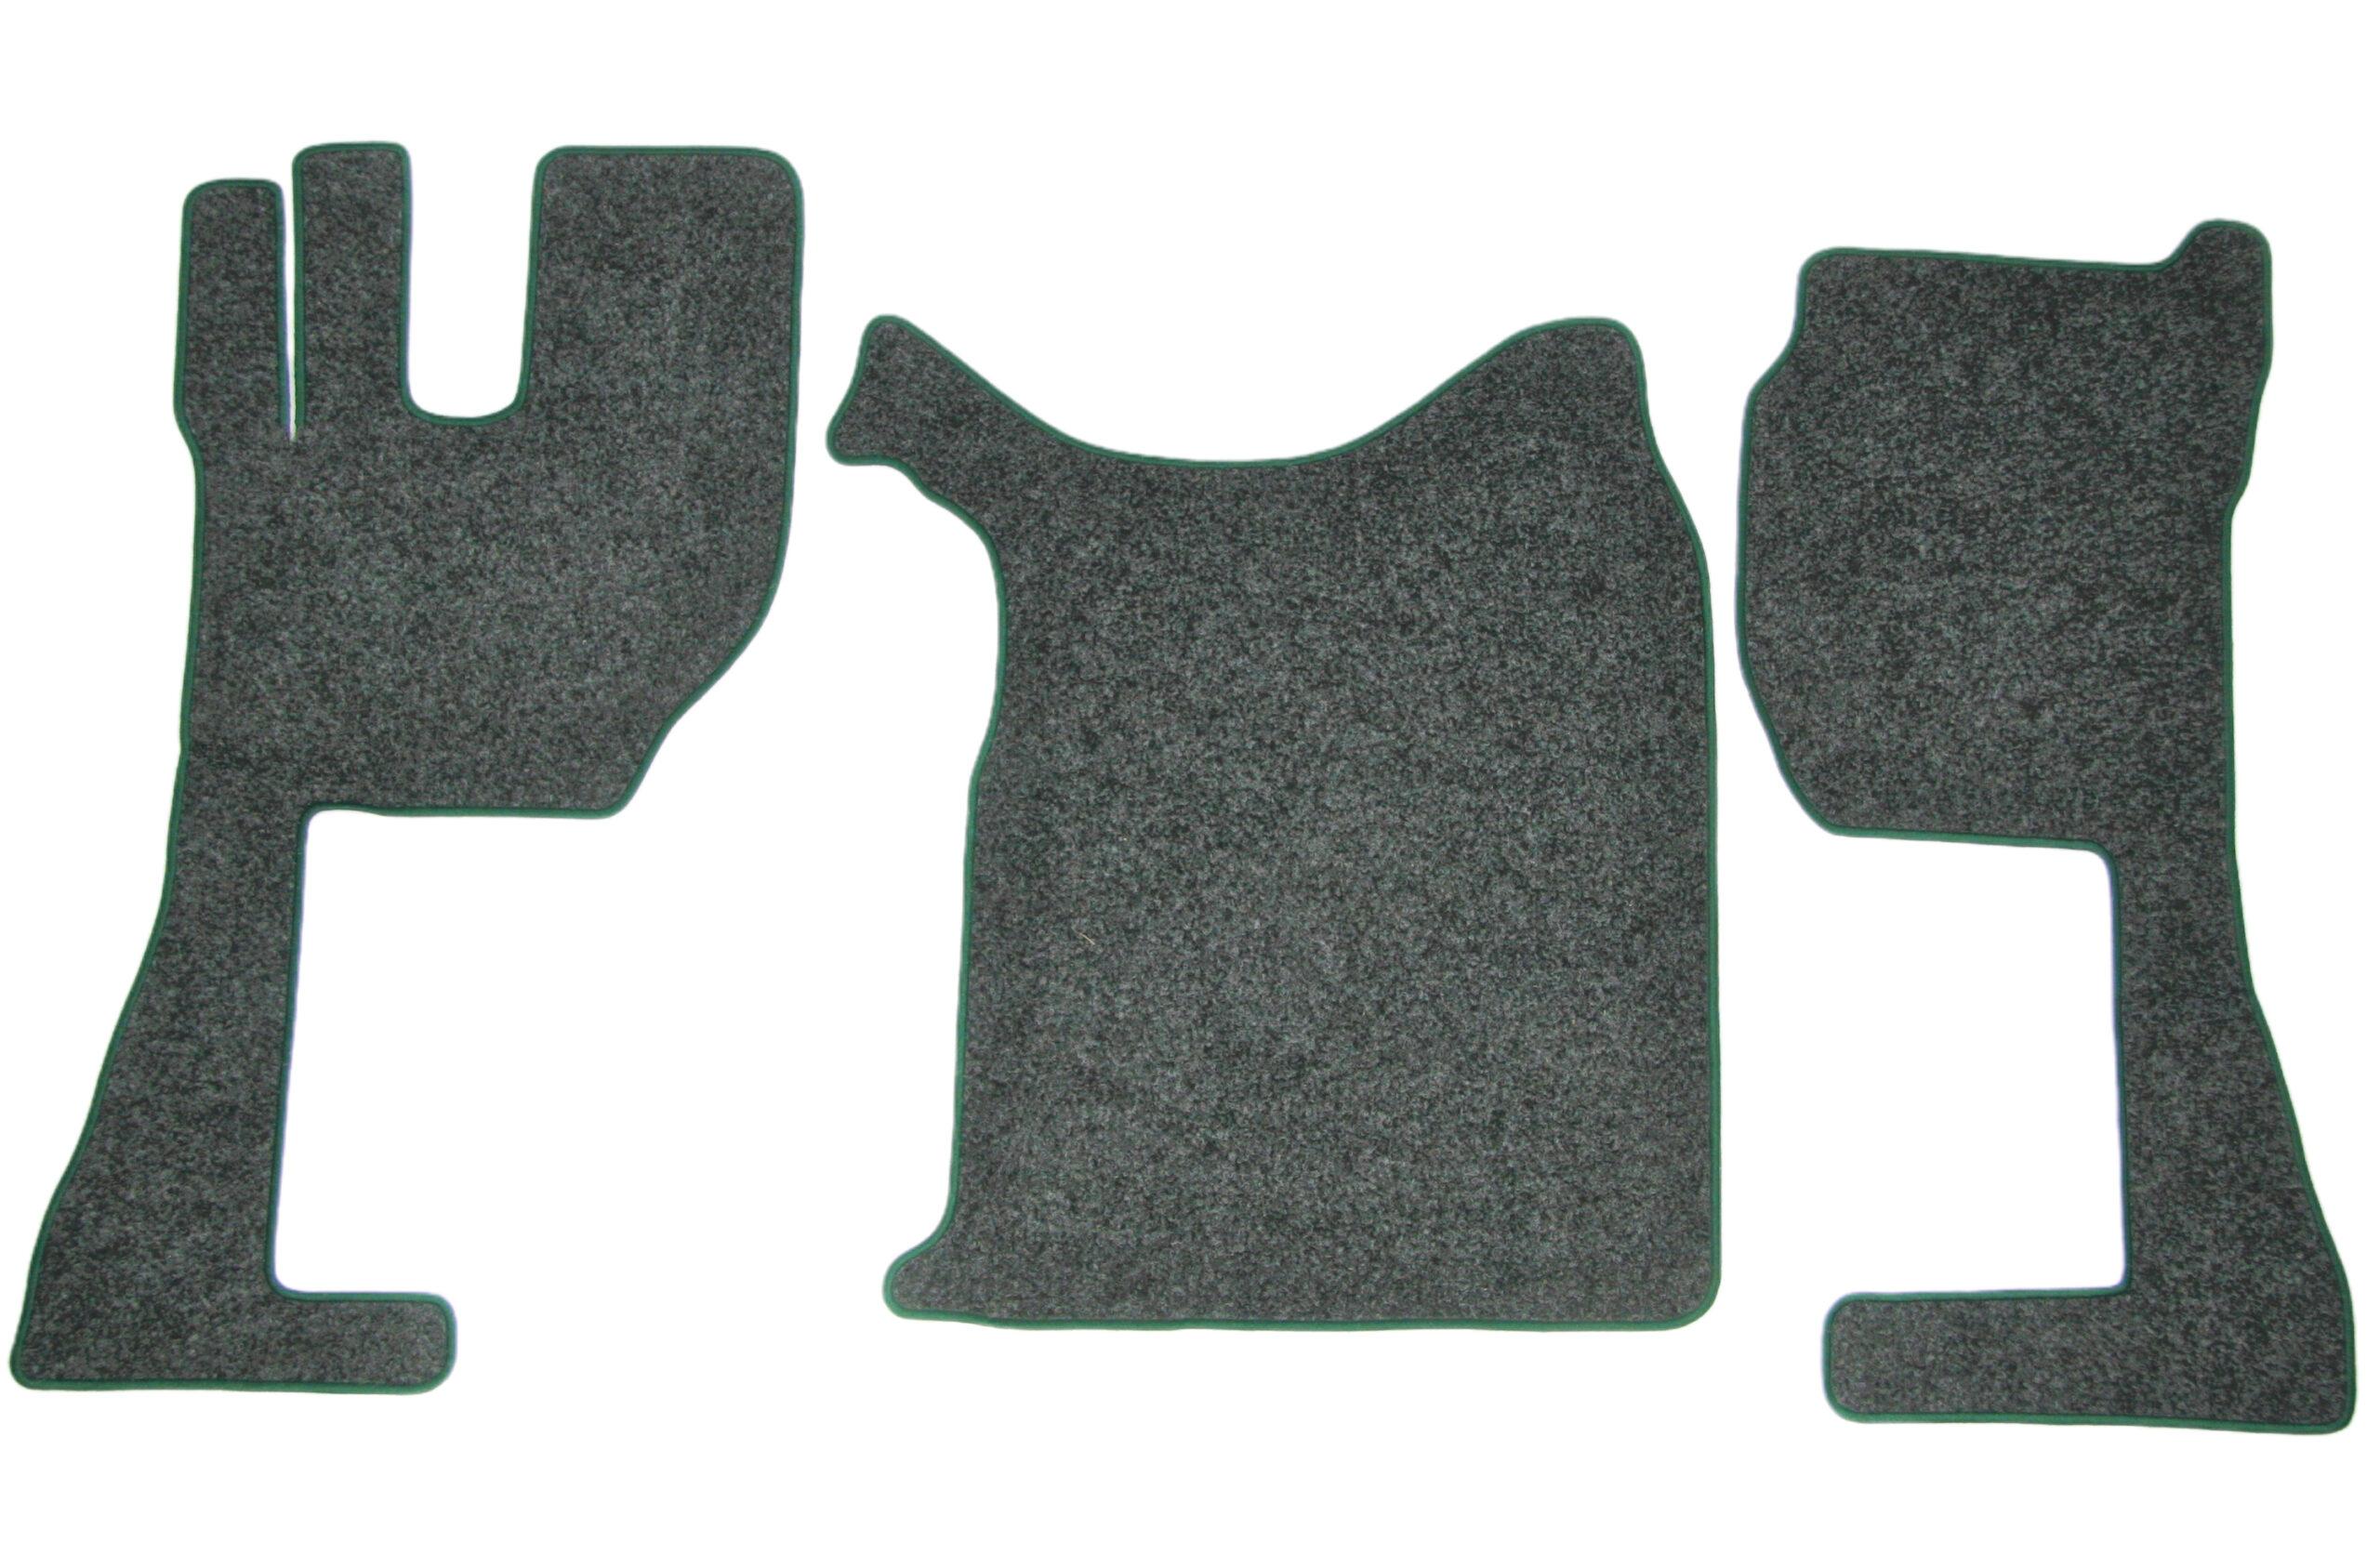 Volvo mats - 2012